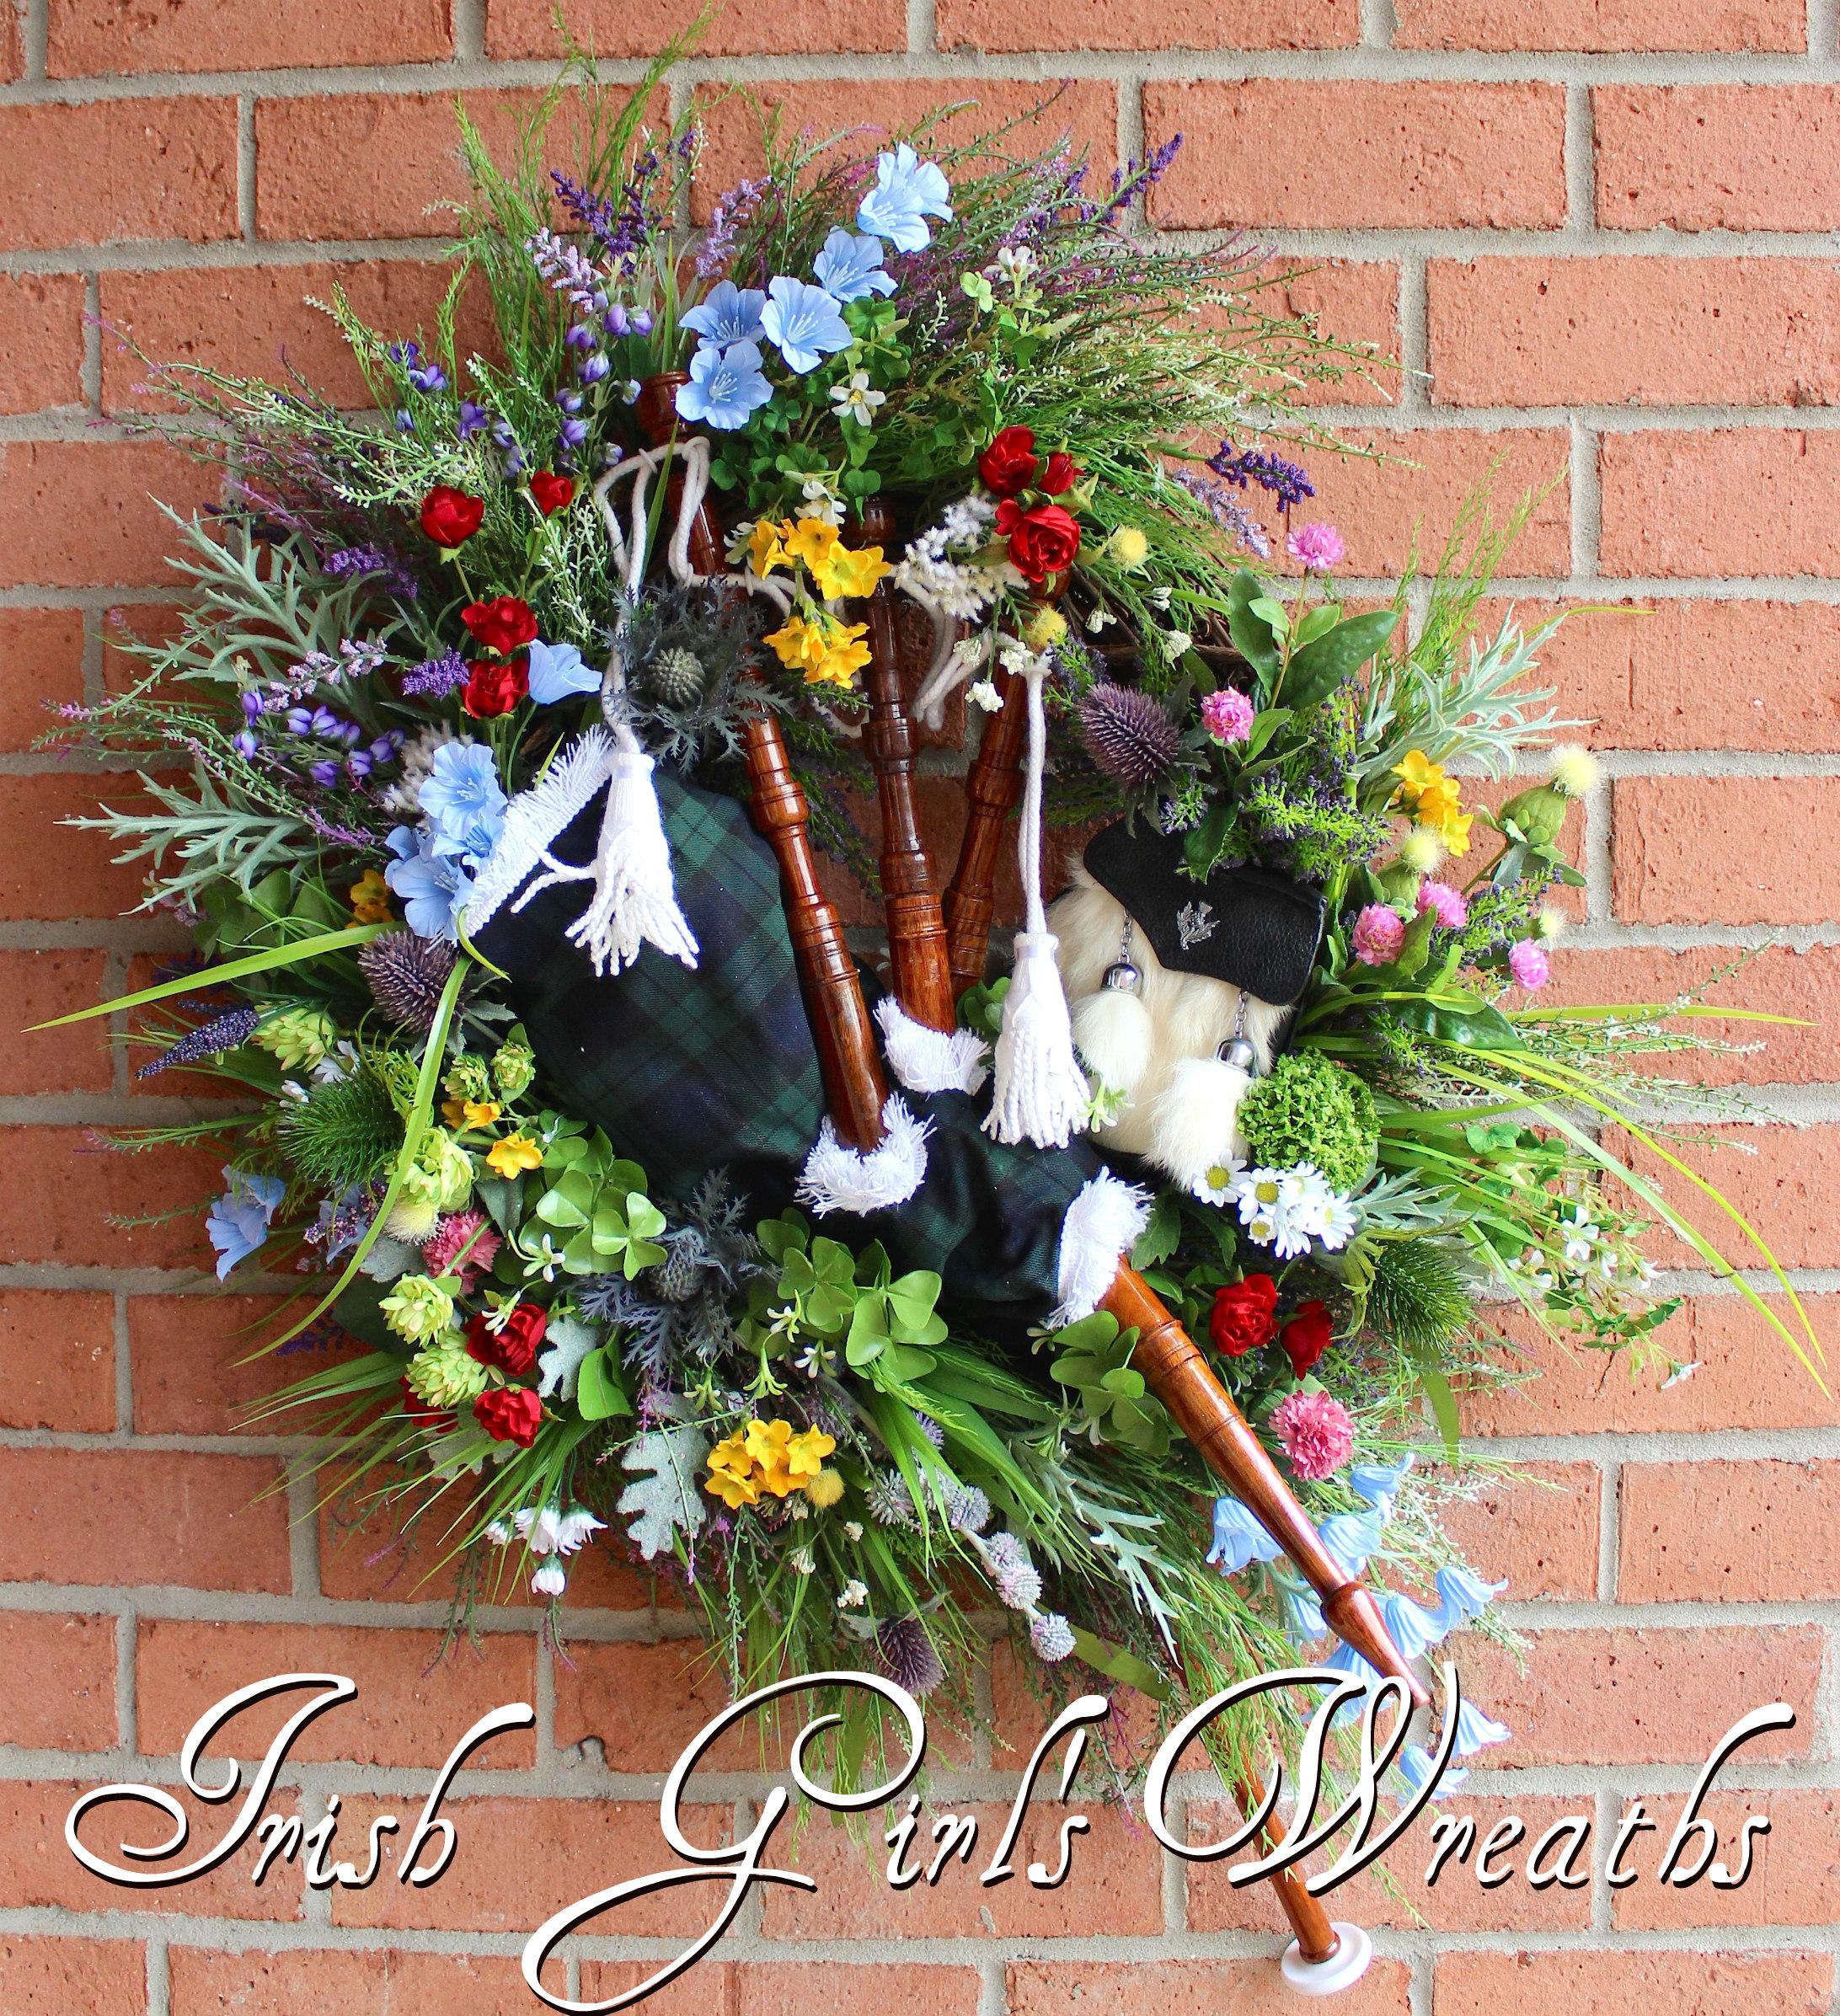 Irish Wildflower Bagpipes and Sporran Wreath, Custom Order